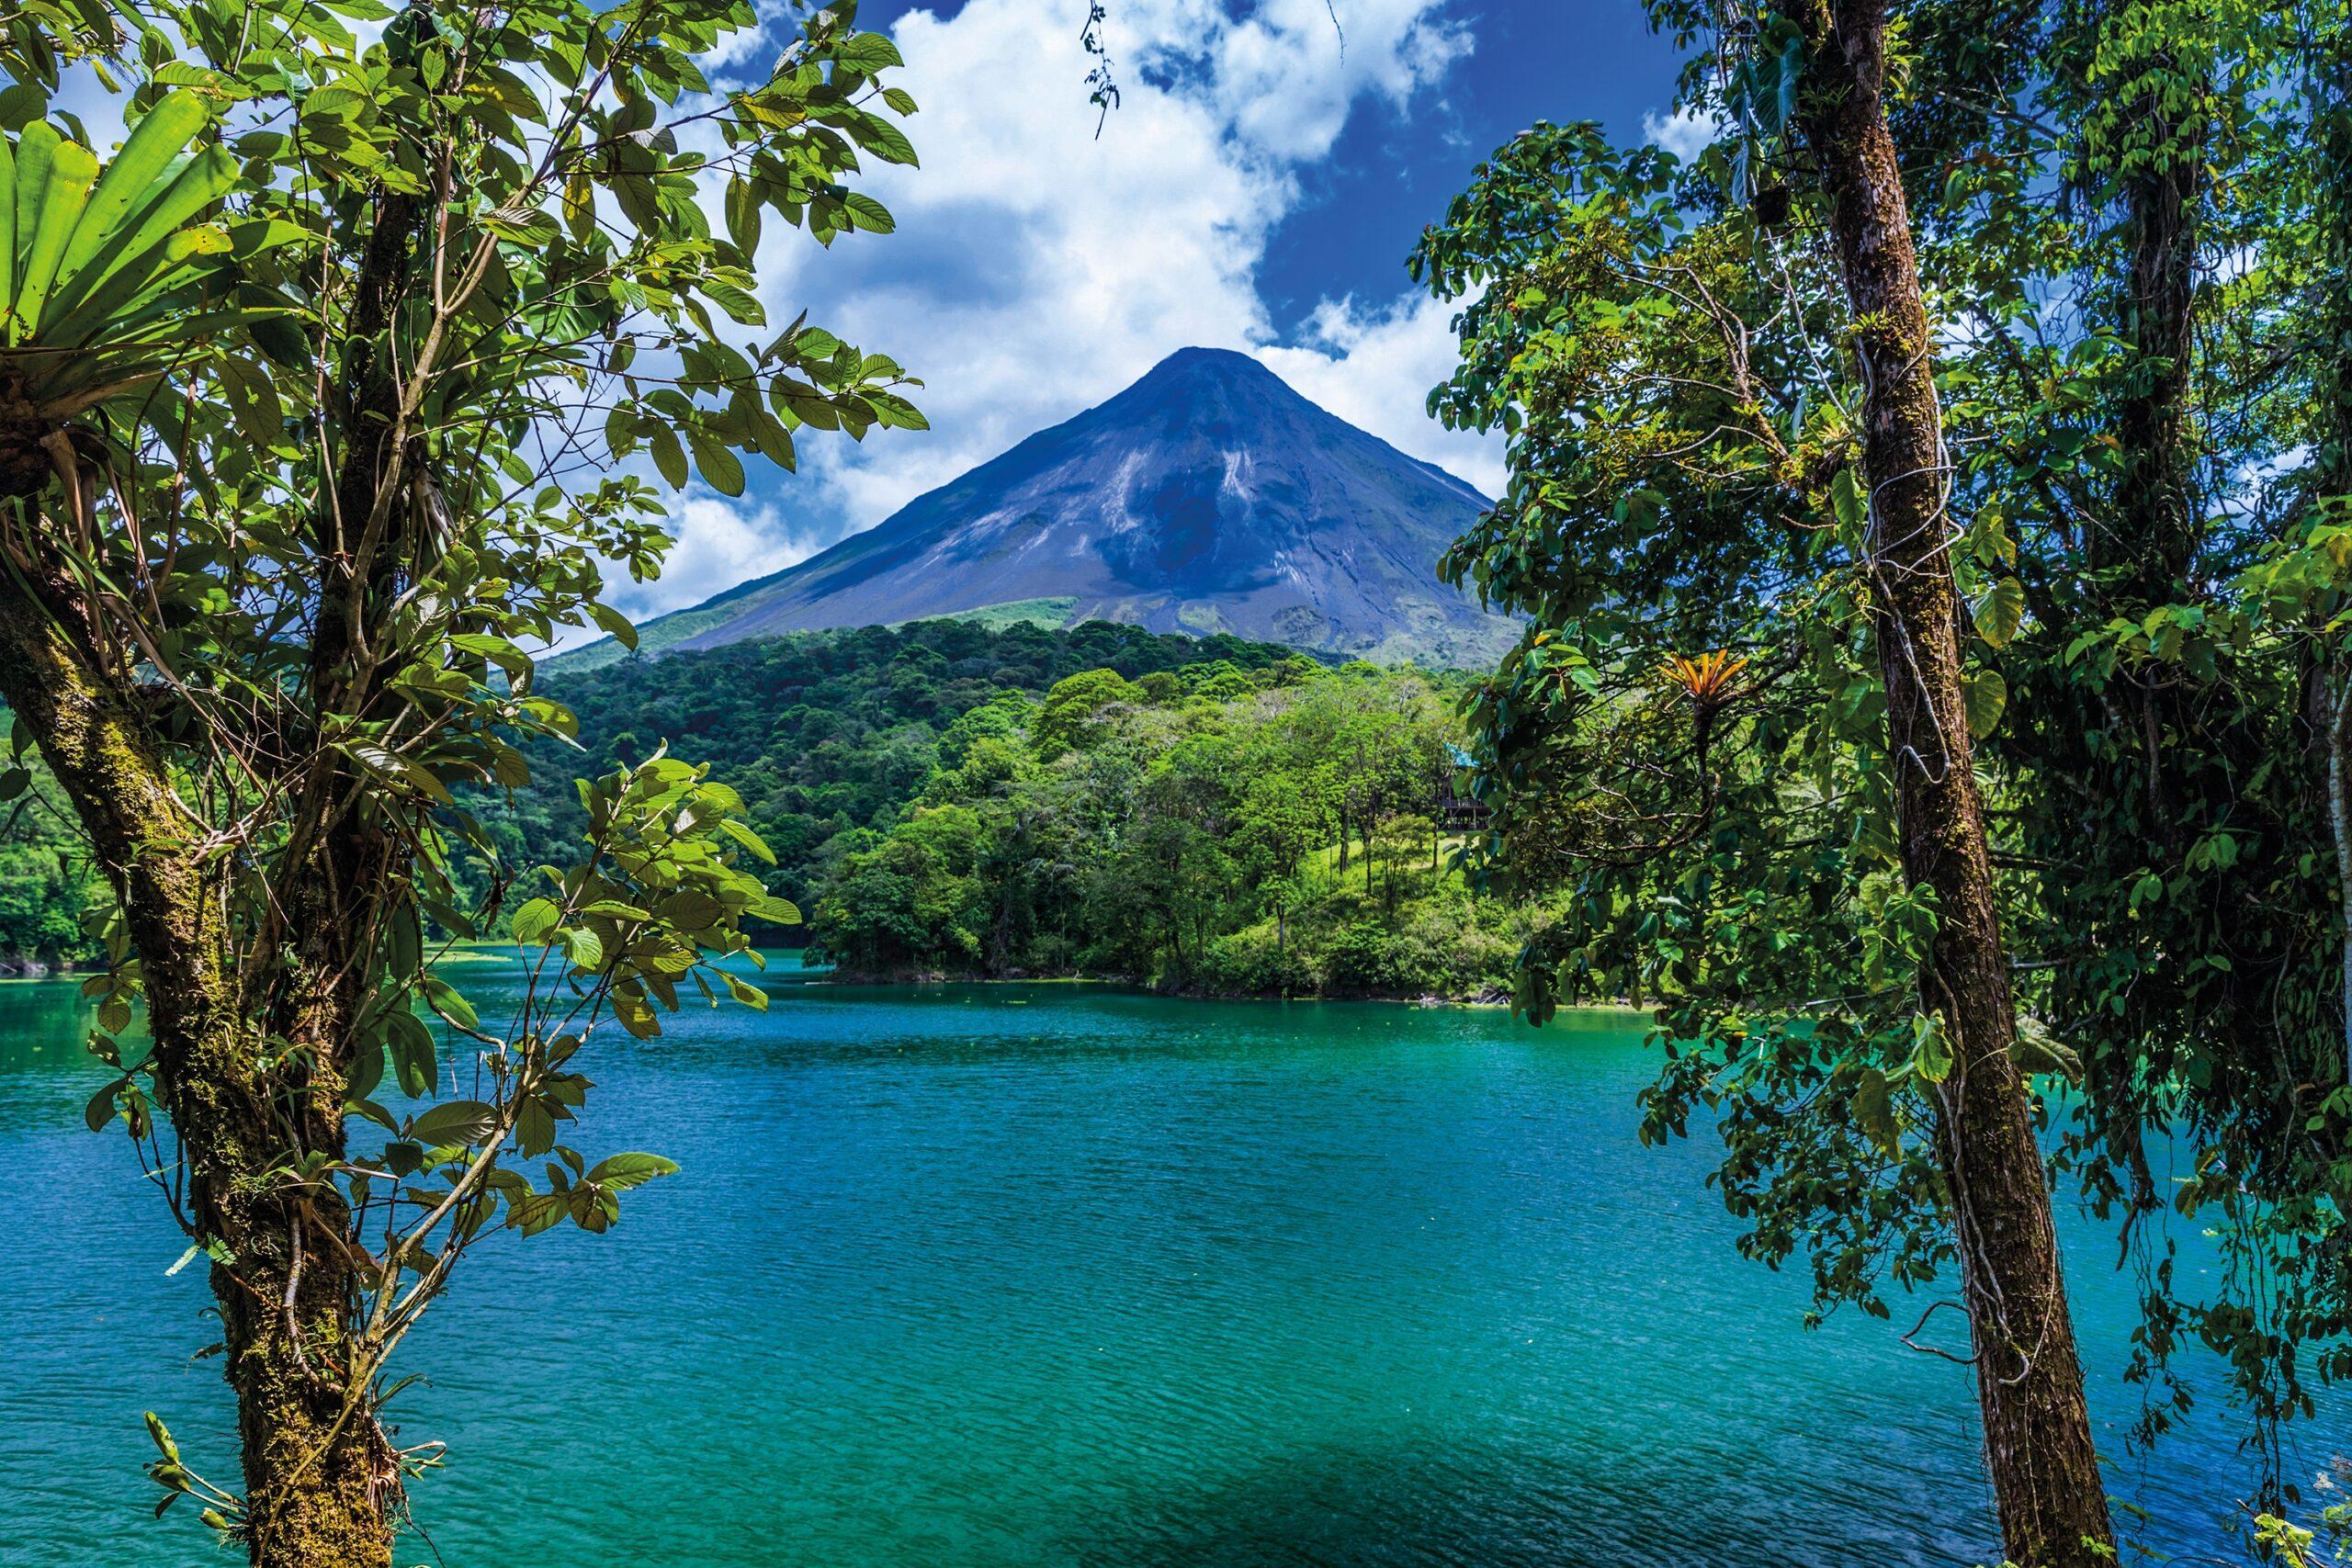 Costa Rica Makes Big Move with Congress Approving Legislation of Medicinal Marijuana